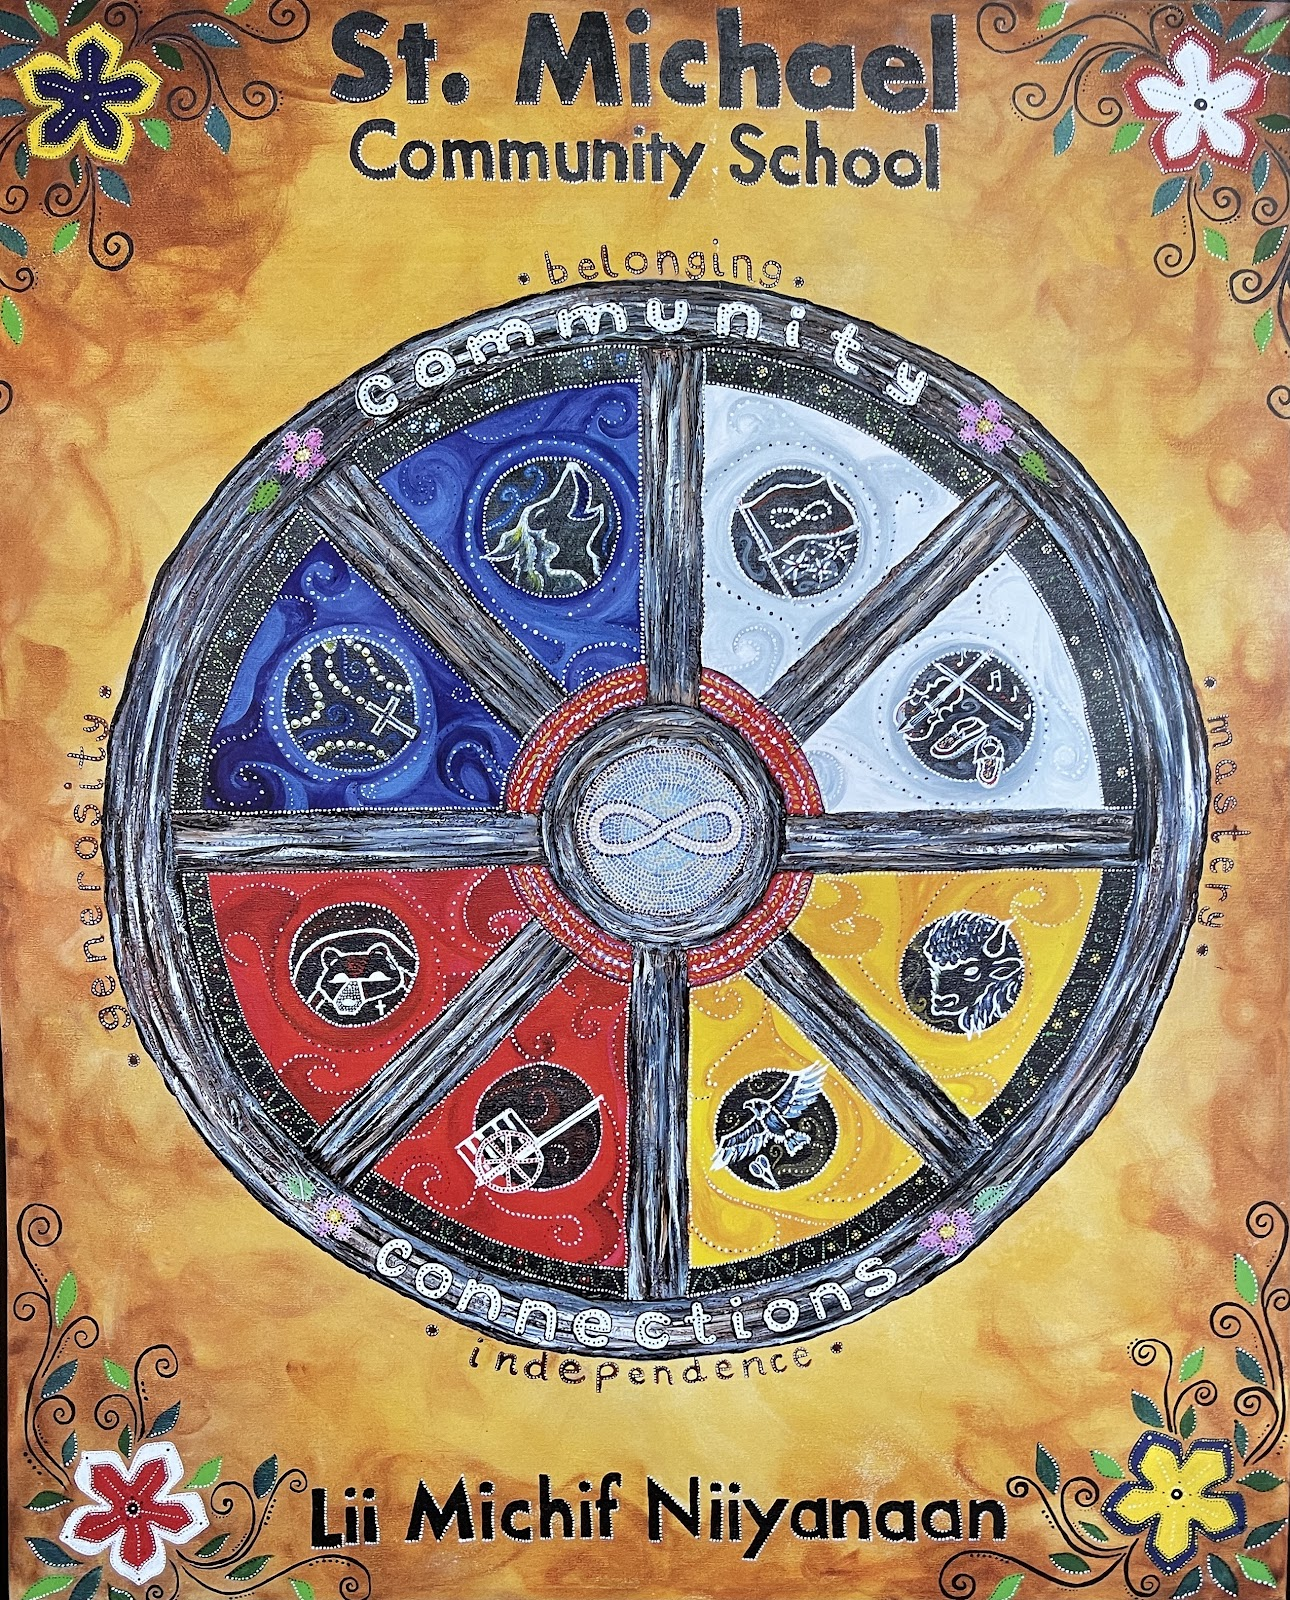 St. Michael Community School wheel/circle